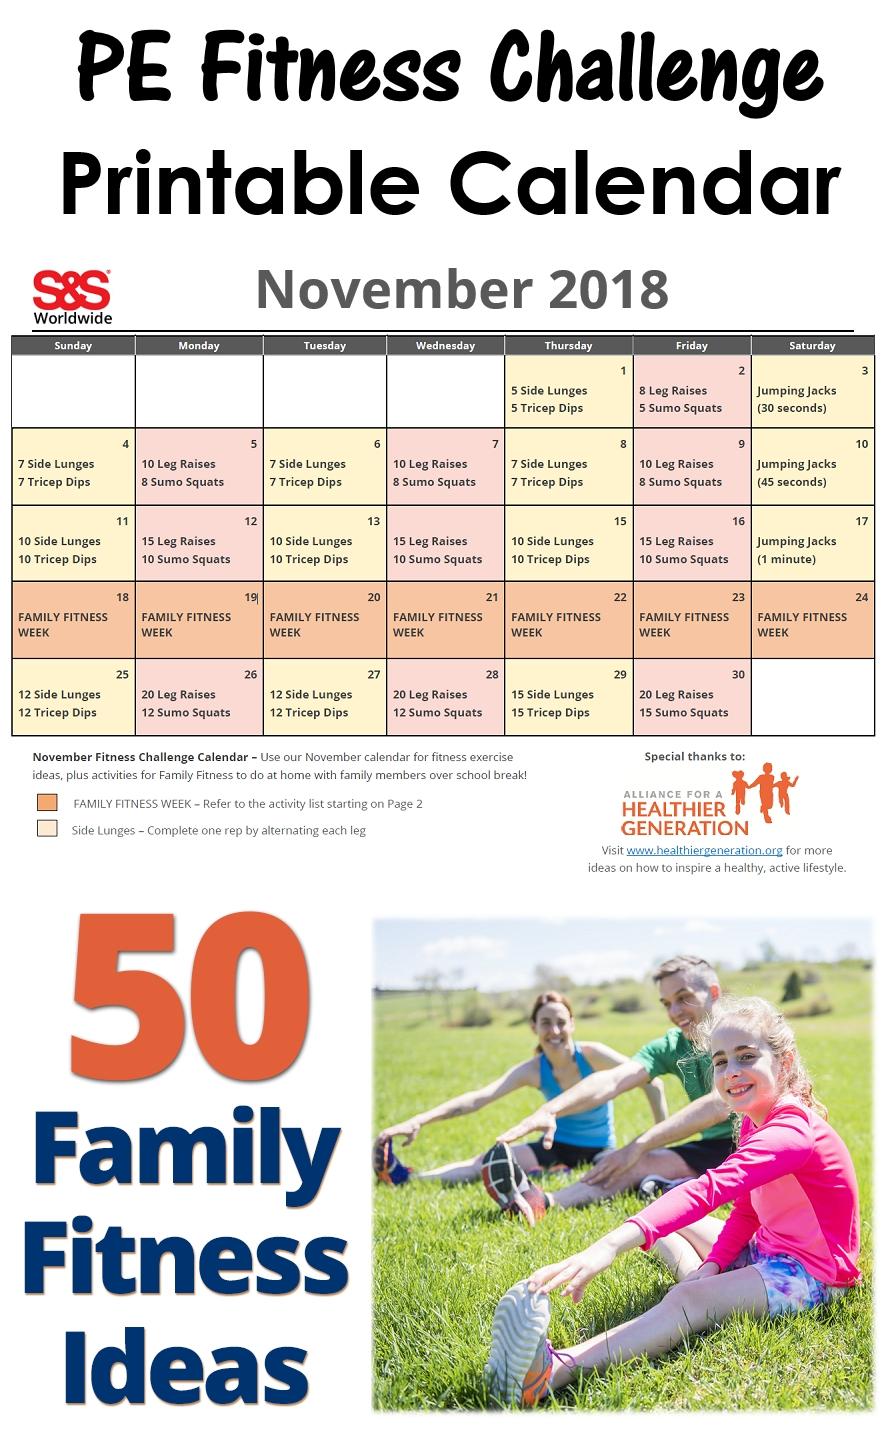 November Printable Fitness Challenge Calendar - S&S Blog